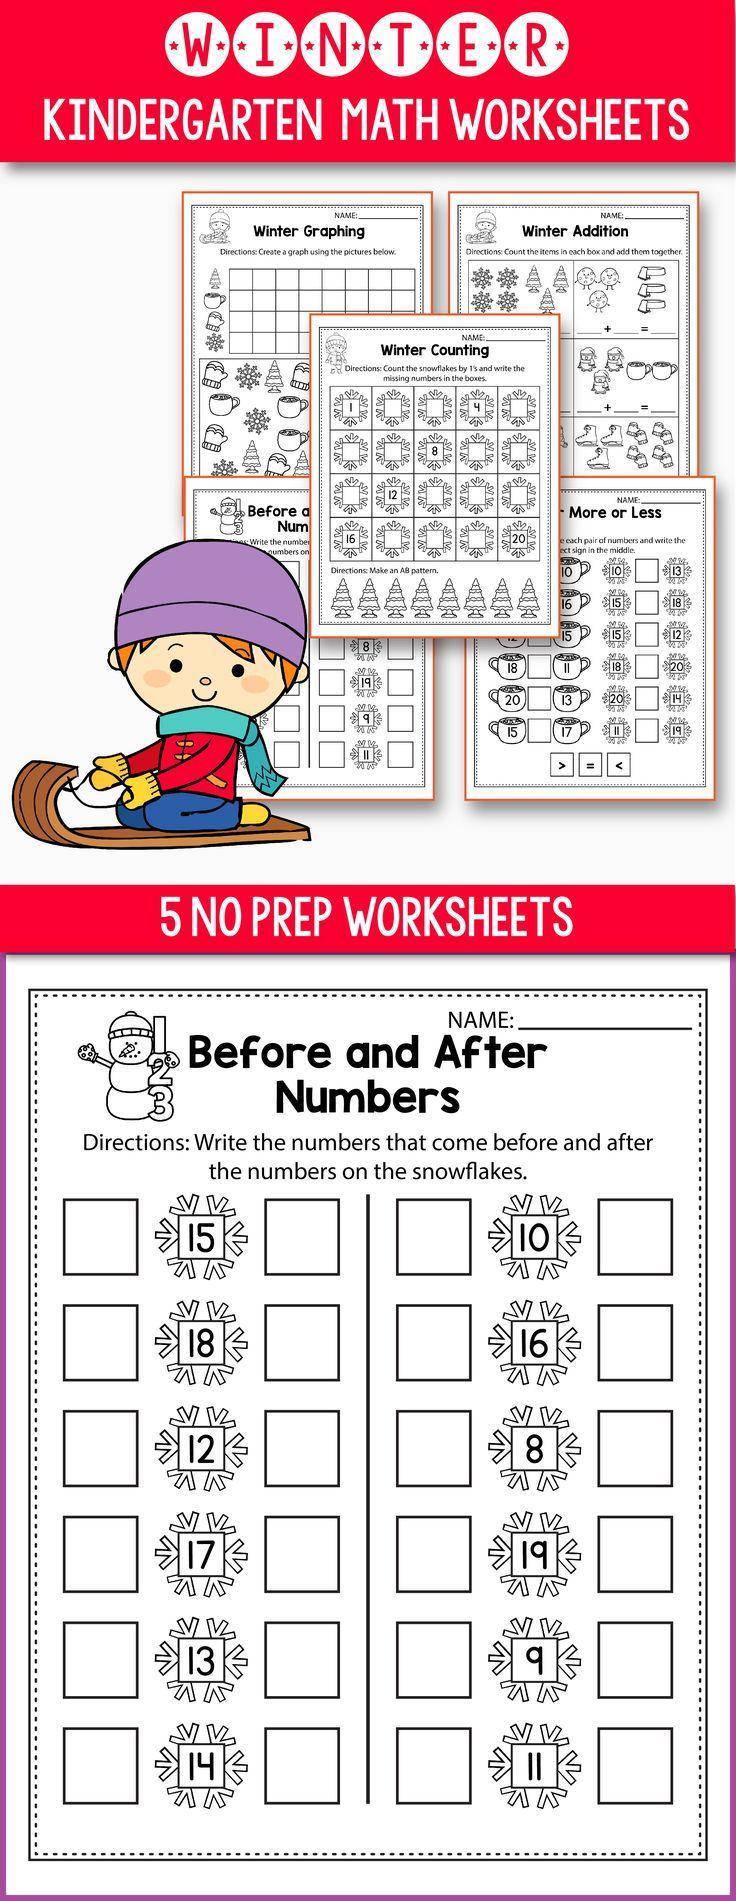 Kindergarten Math And Ela Winter Worksheets Includes Over 60 Math And Ela Kindergarten Kindergarten Math Worksheets Winter Math Worksheets Kindergarten Math